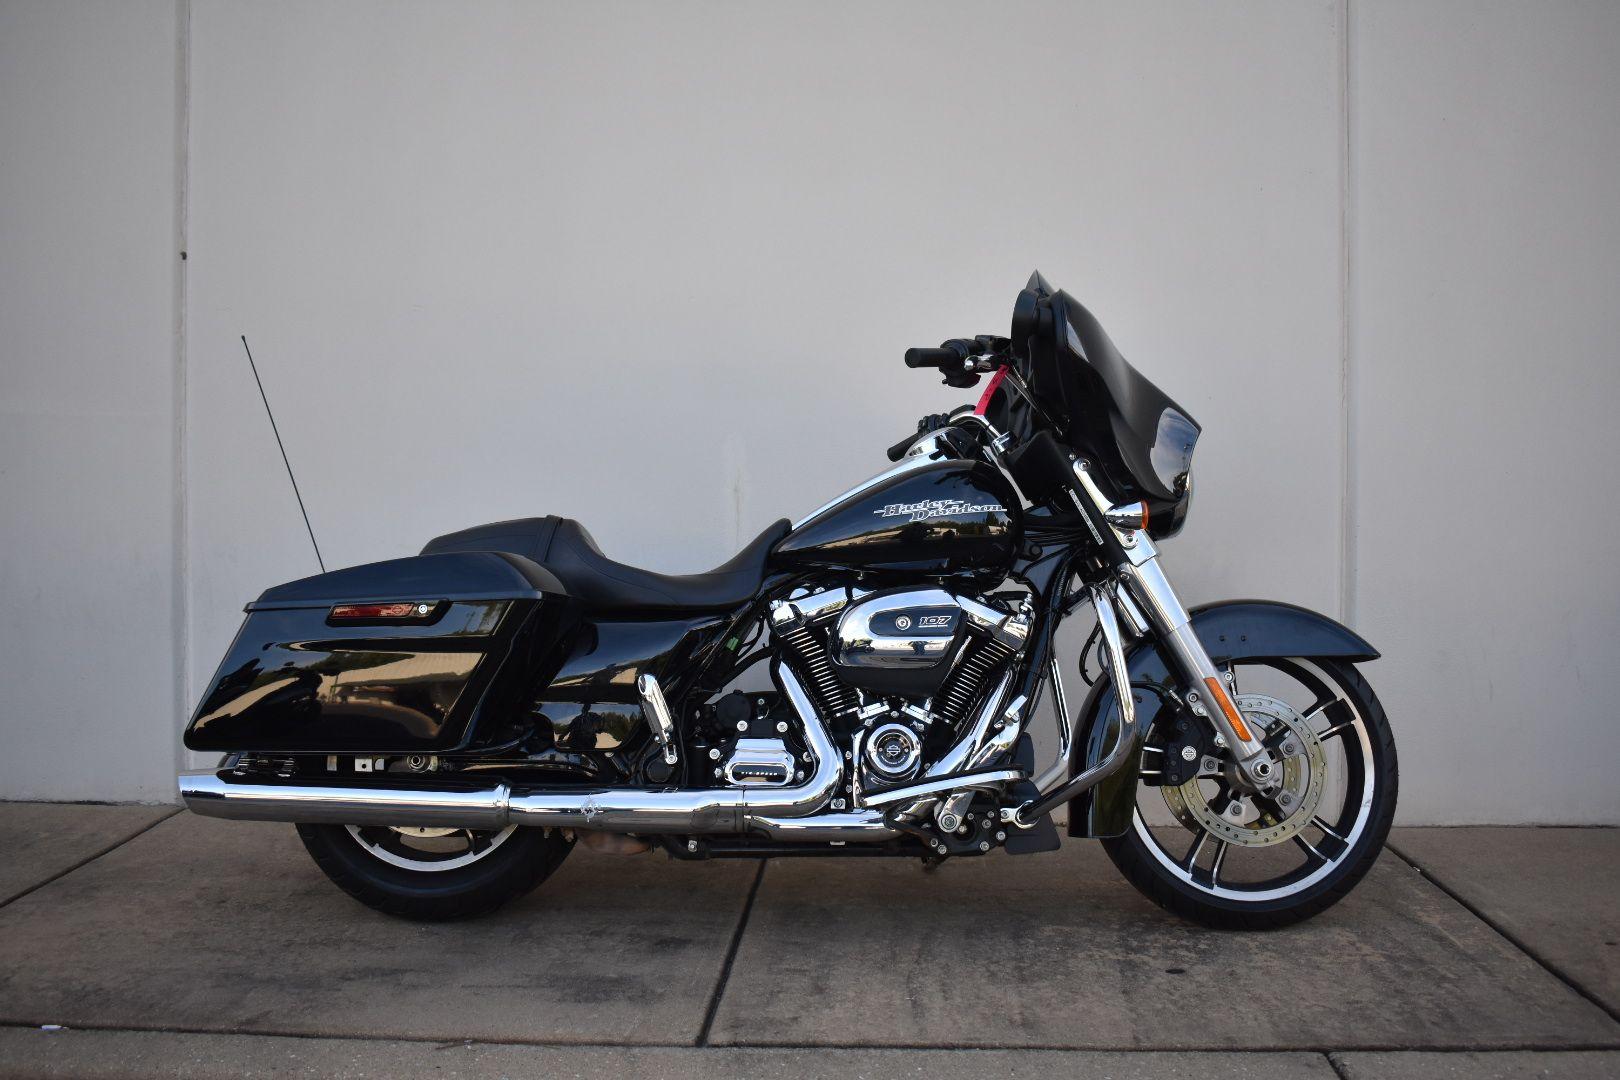 Certified Pre-Owned 2019 Harley-Davidson Street Glide FLHX